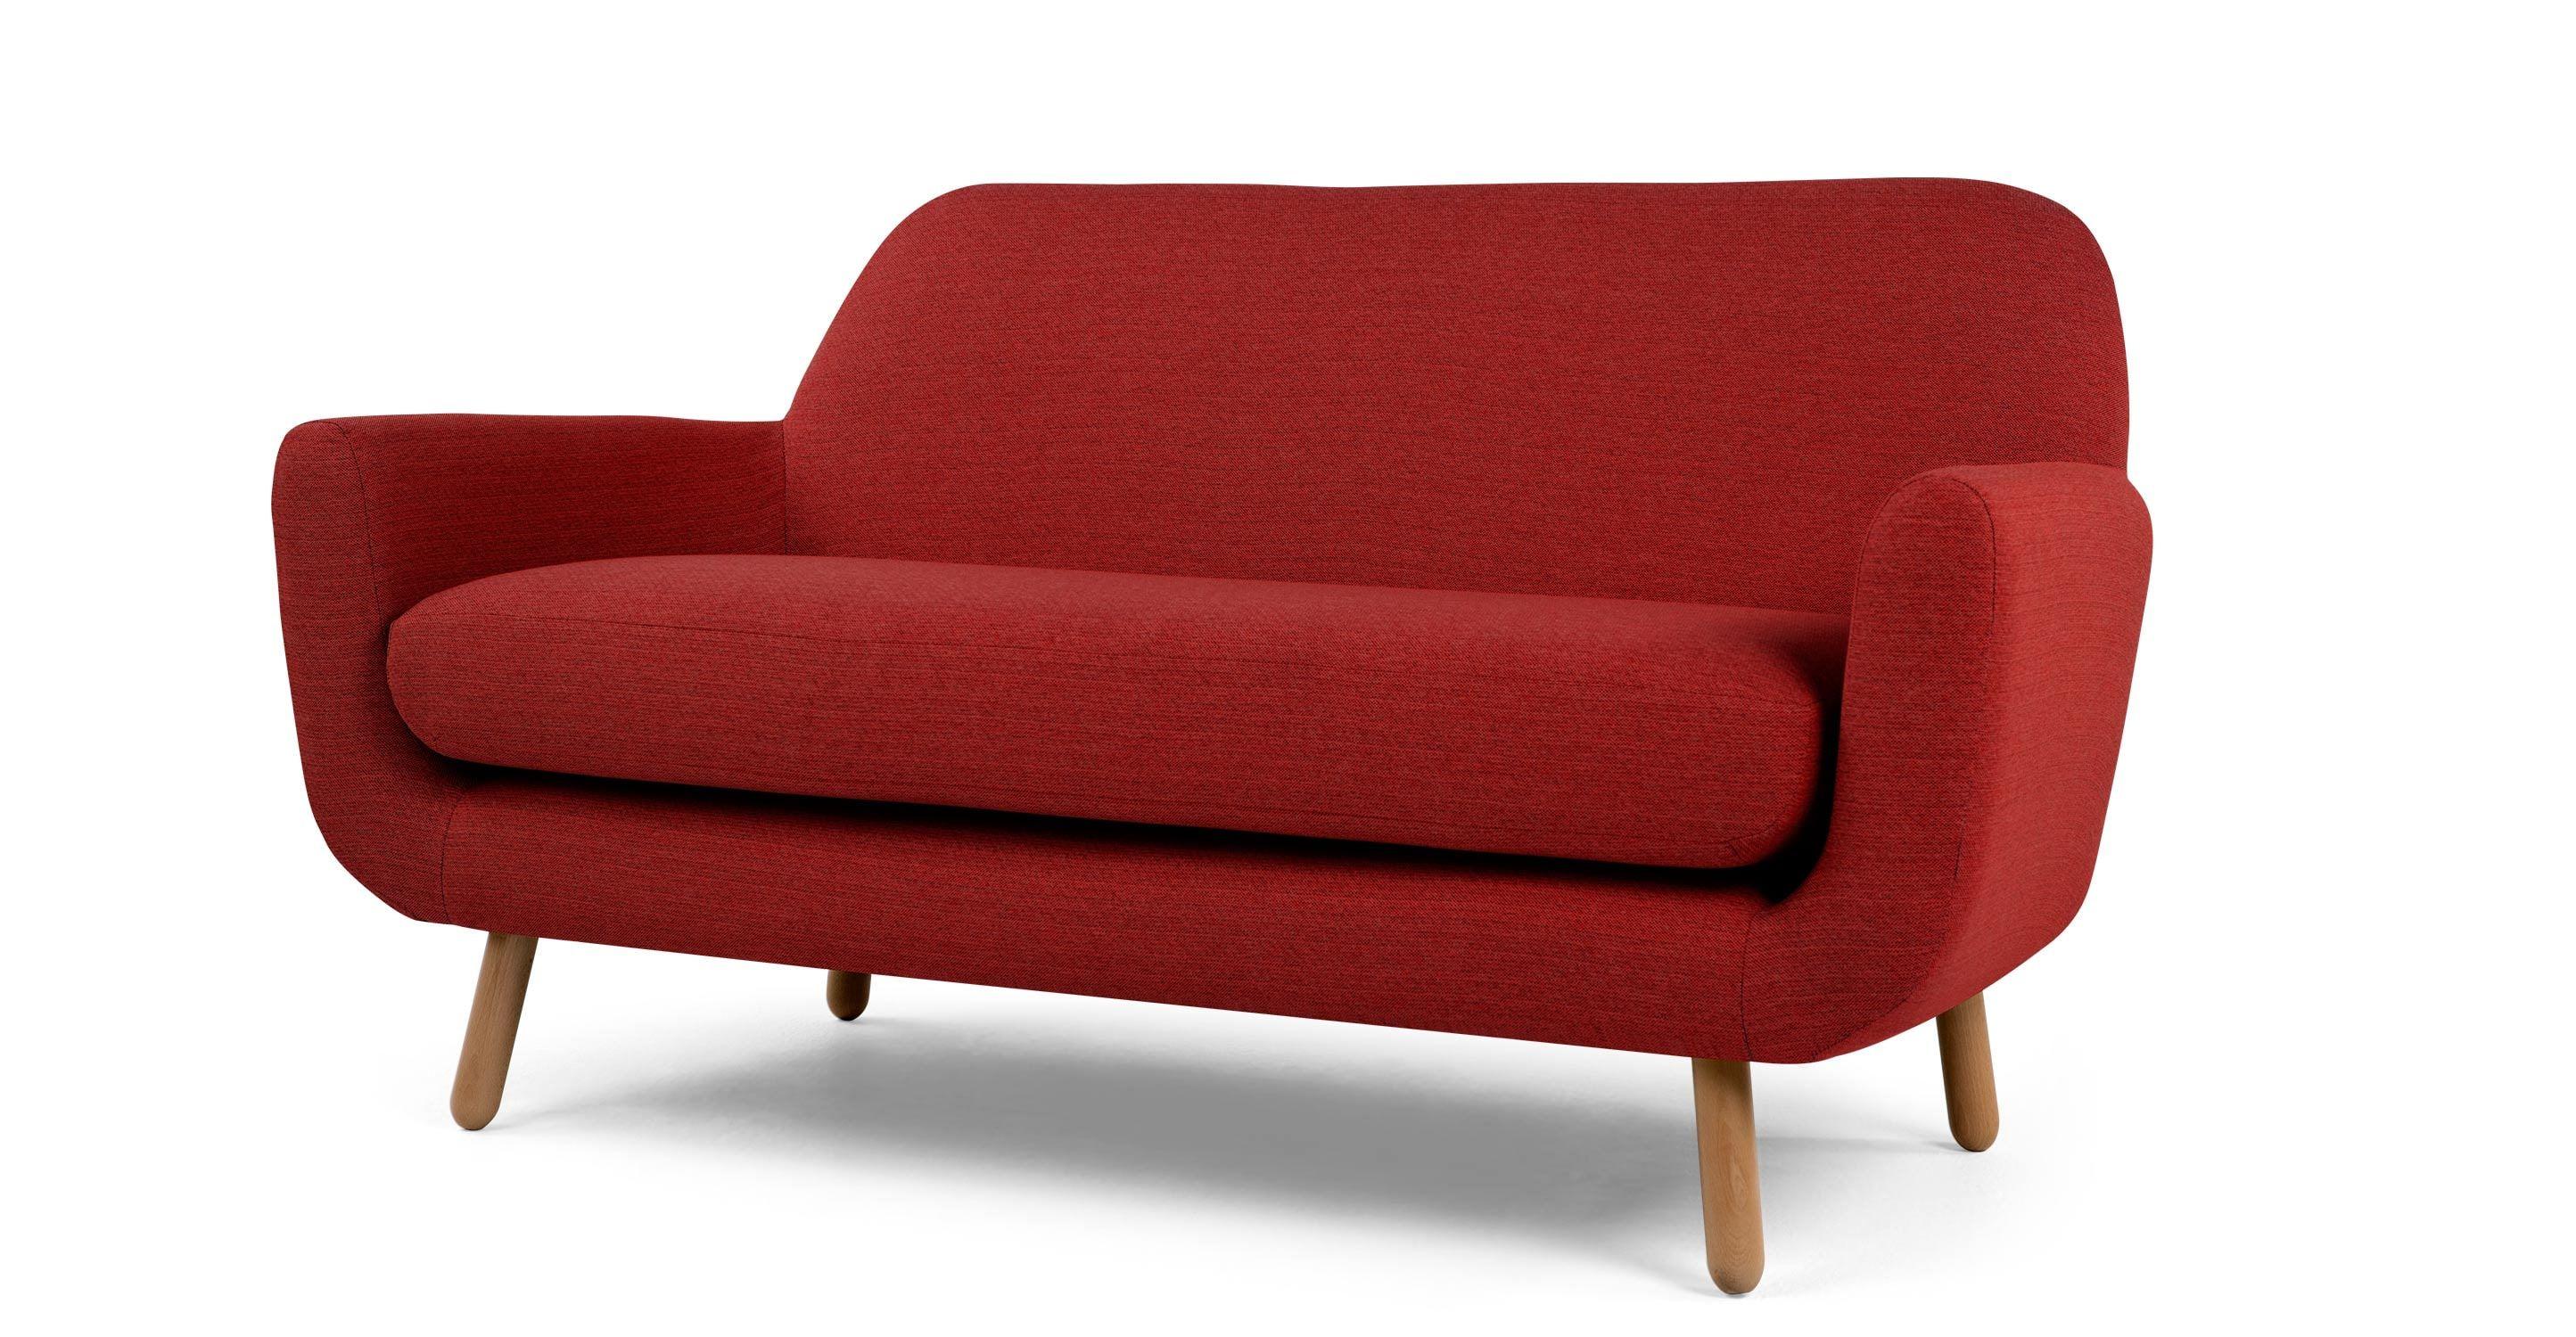 Jonah 2 Seater Sofa Ketchup Red